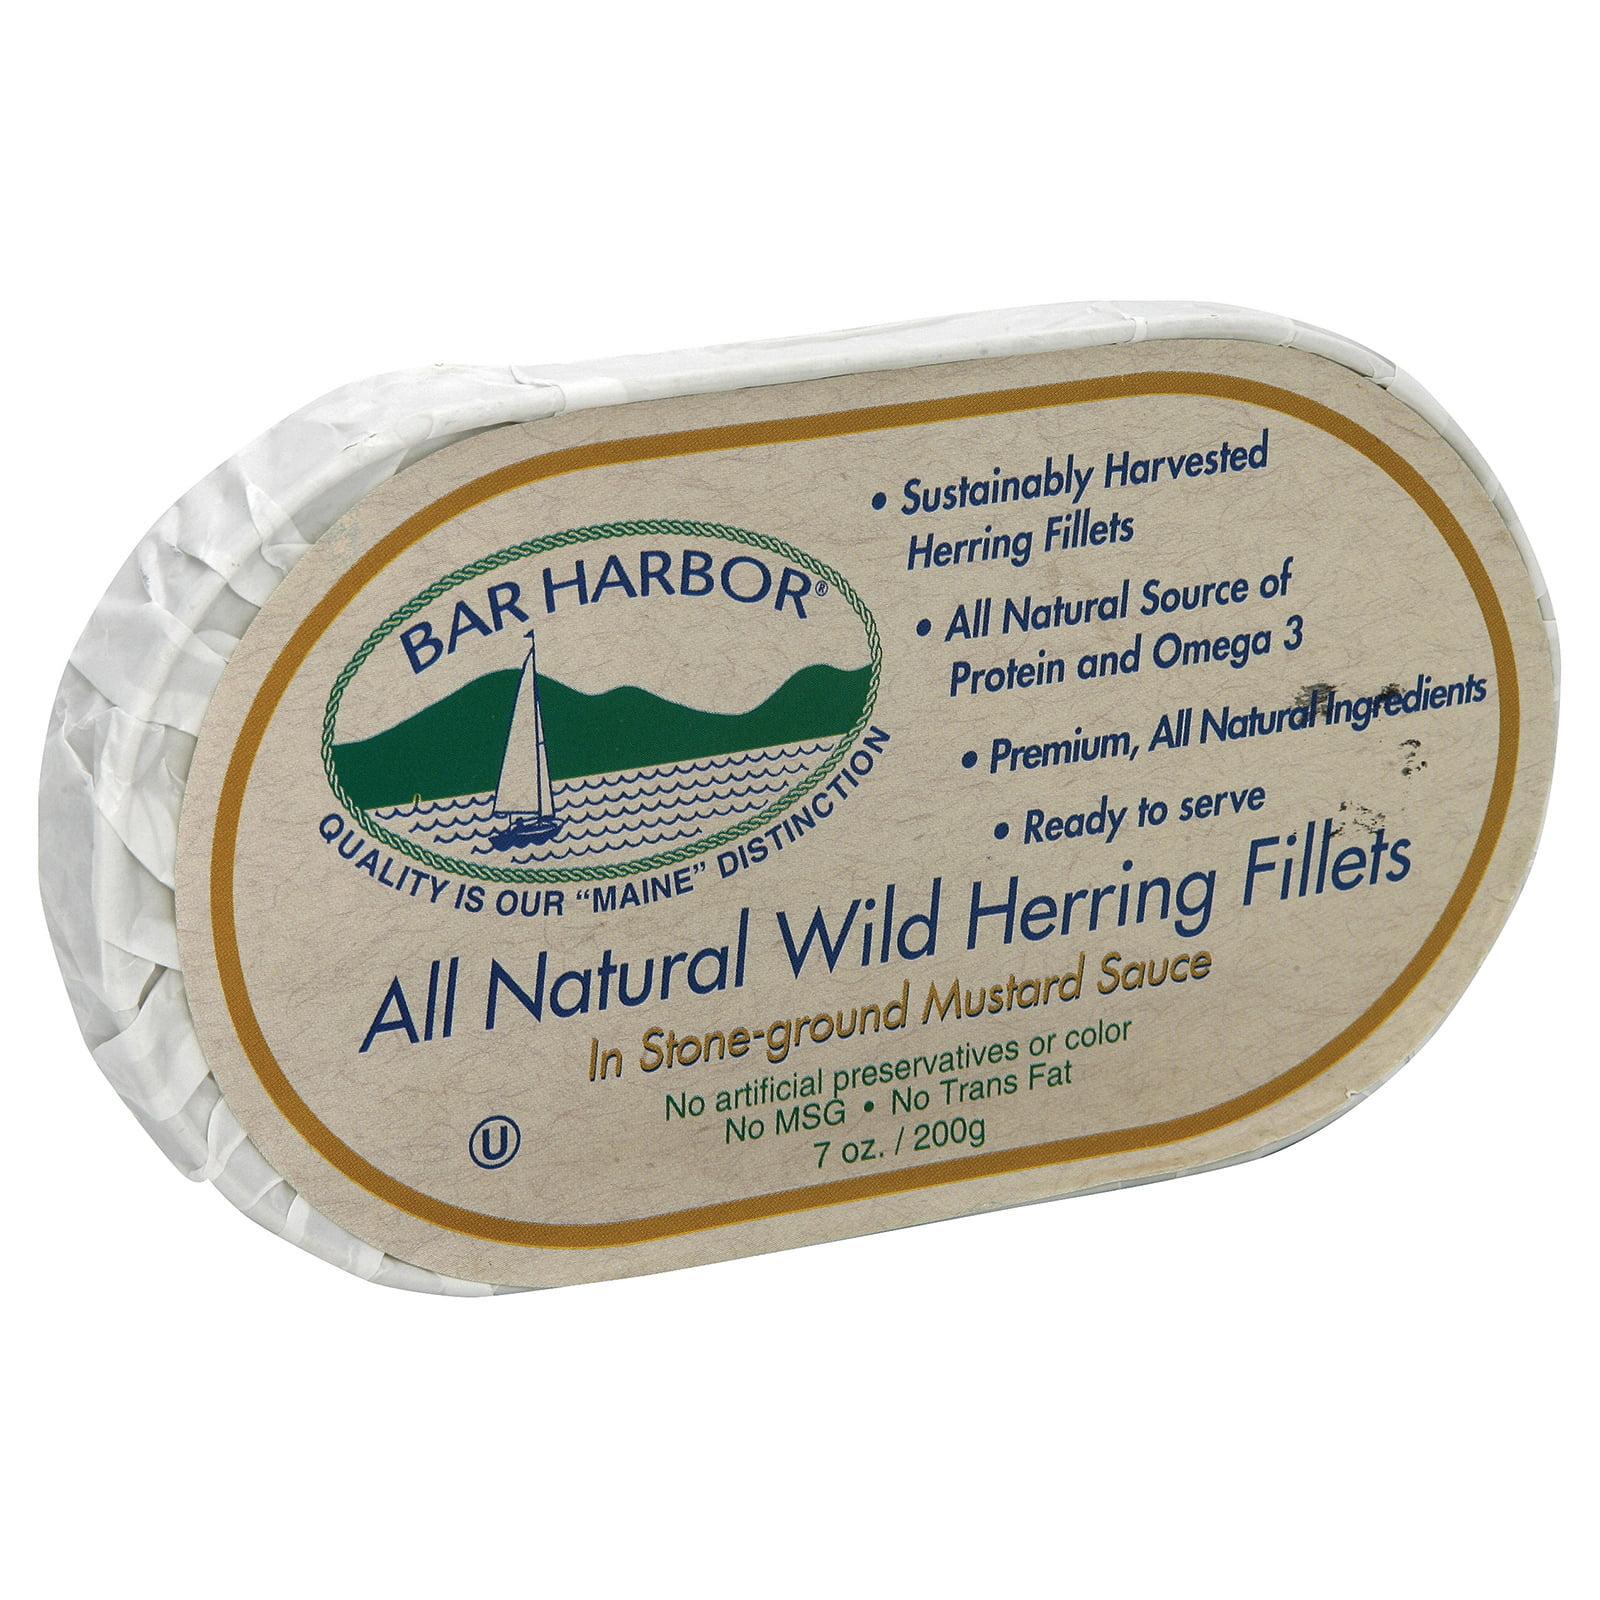 Bar Harbor Wild Herring Fillets Stone Ground Mustard Sauce Case of 12 7 oz. by